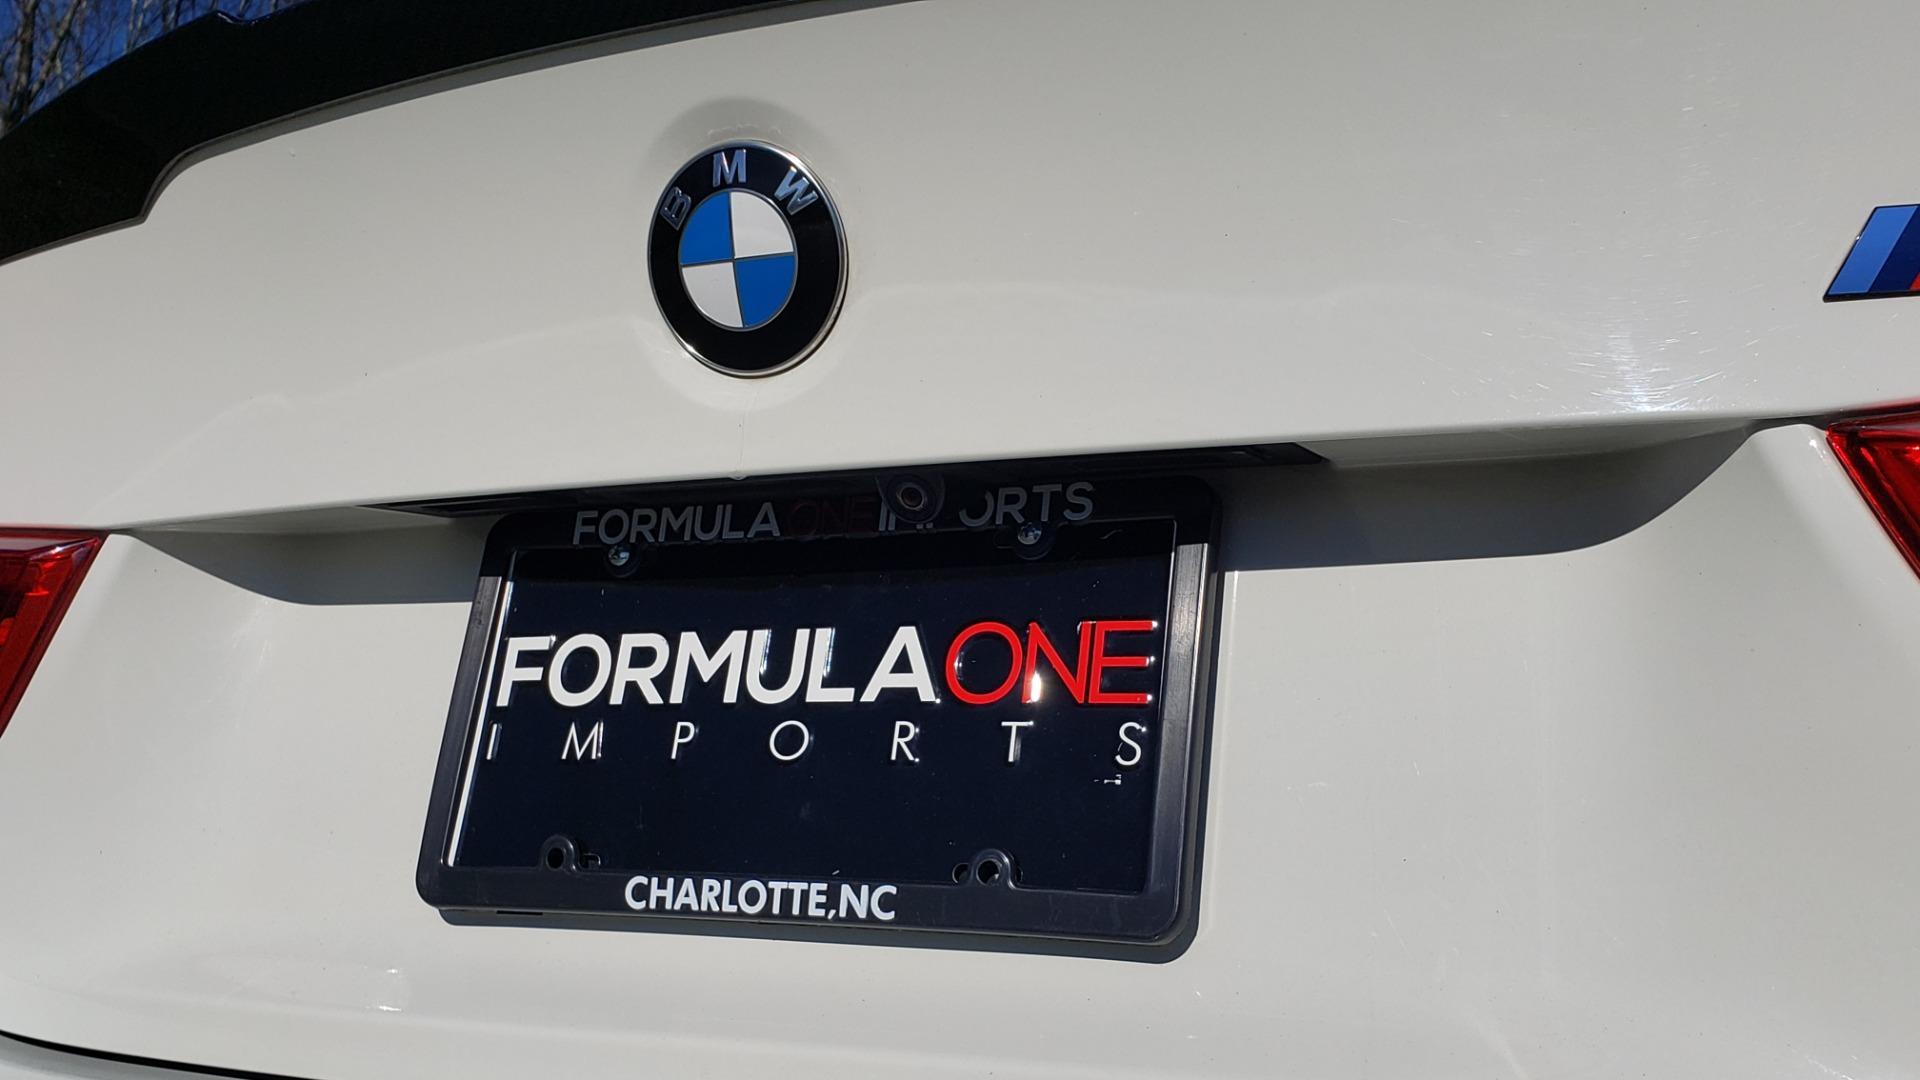 Used 2018 BMW M4 COMP PKG / EXEC / M-DRIVER / PARK CNTRL / ACTIVE BLIND SPOT for sale Sold at Formula Imports in Charlotte NC 28227 30